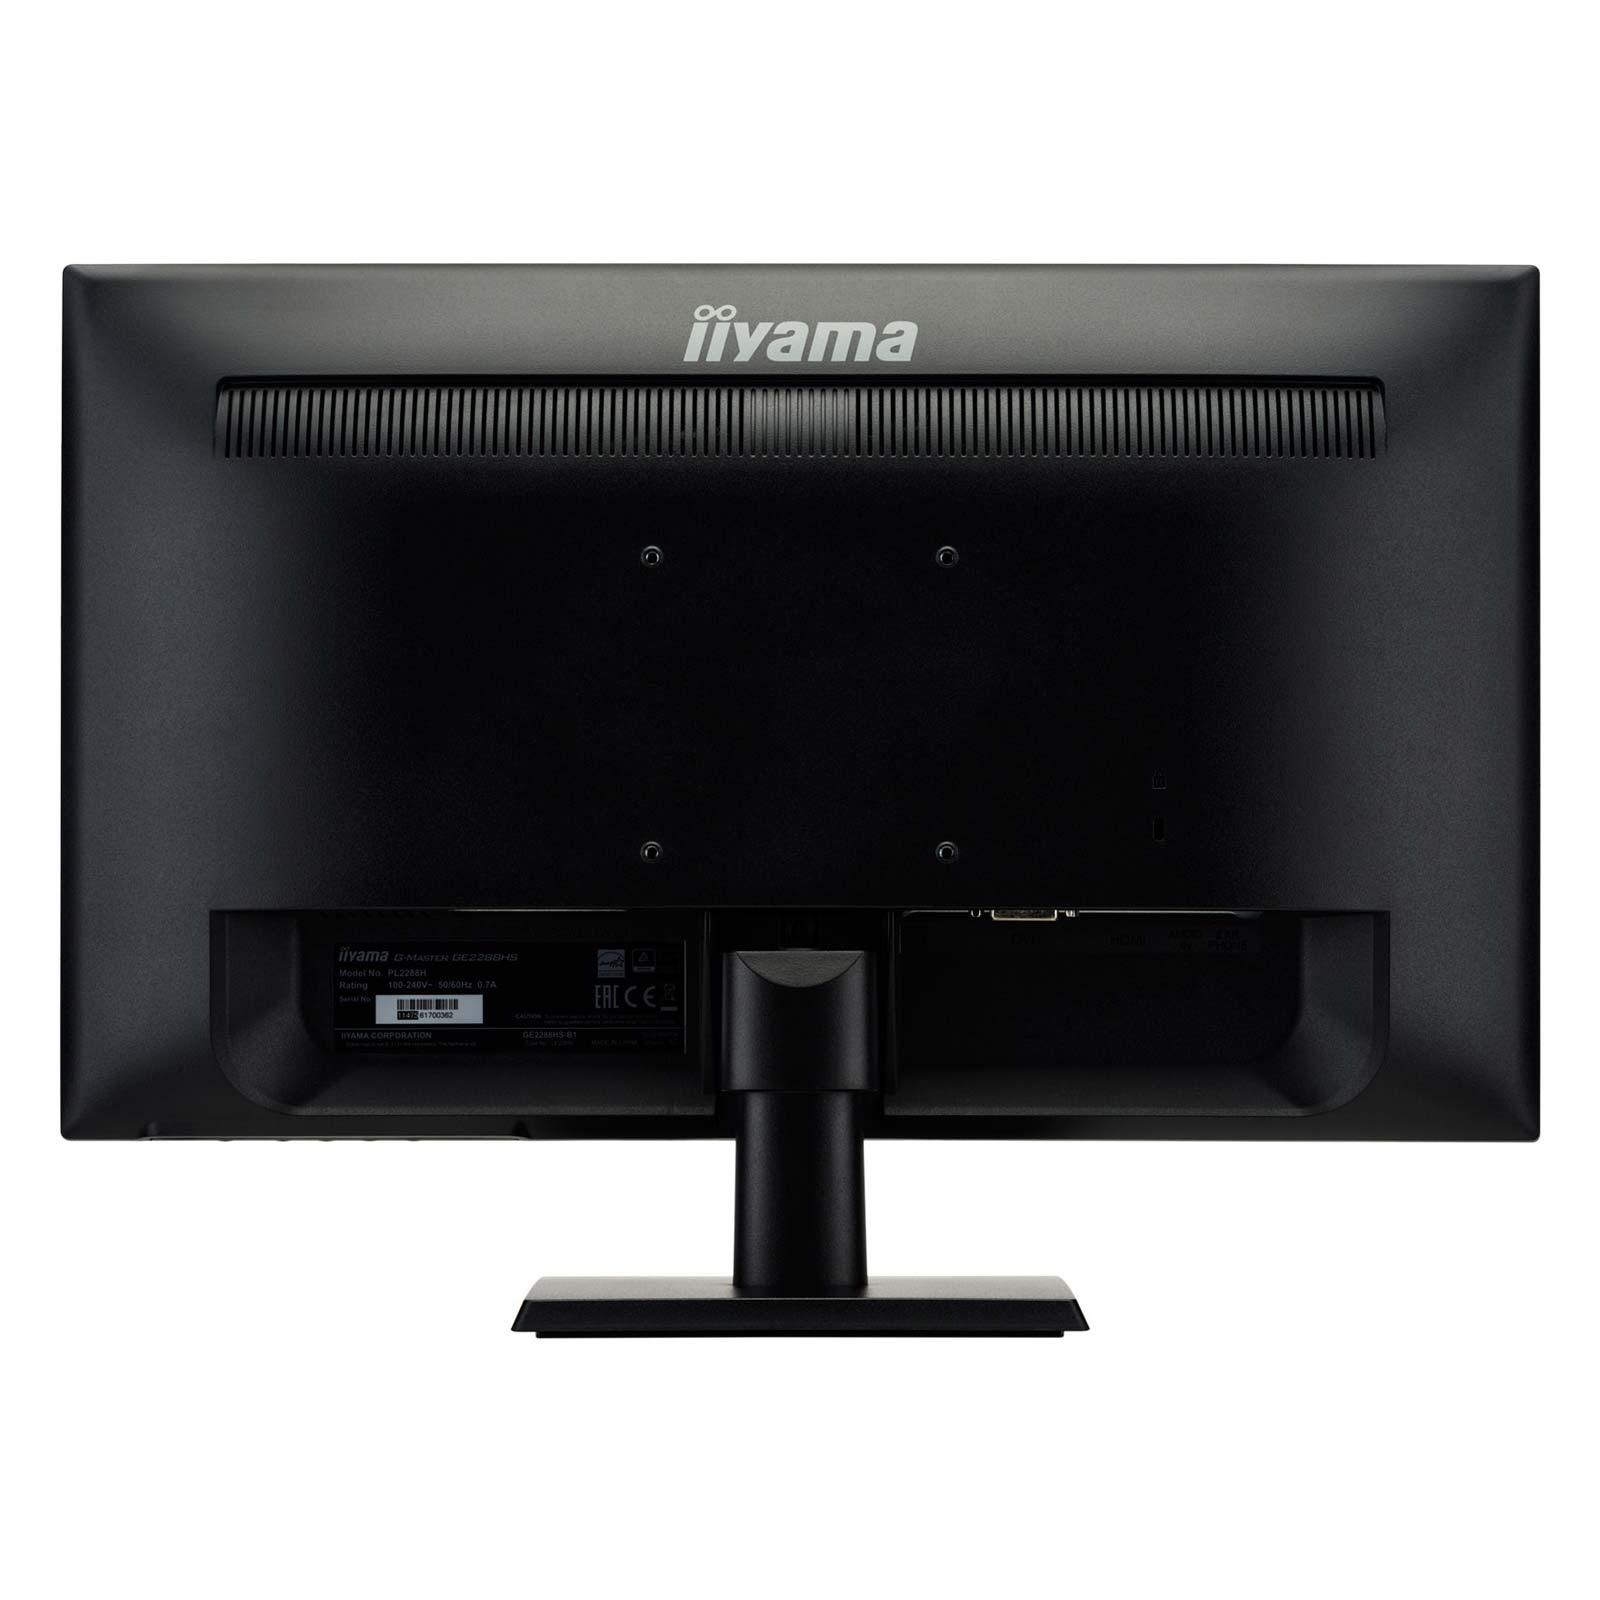 Iiyama GE2288HS-B1 G-Master Black Hawk (GE2288HS-B1) - Achat / Vente Ecran PC sur Cybertek.fr - 3